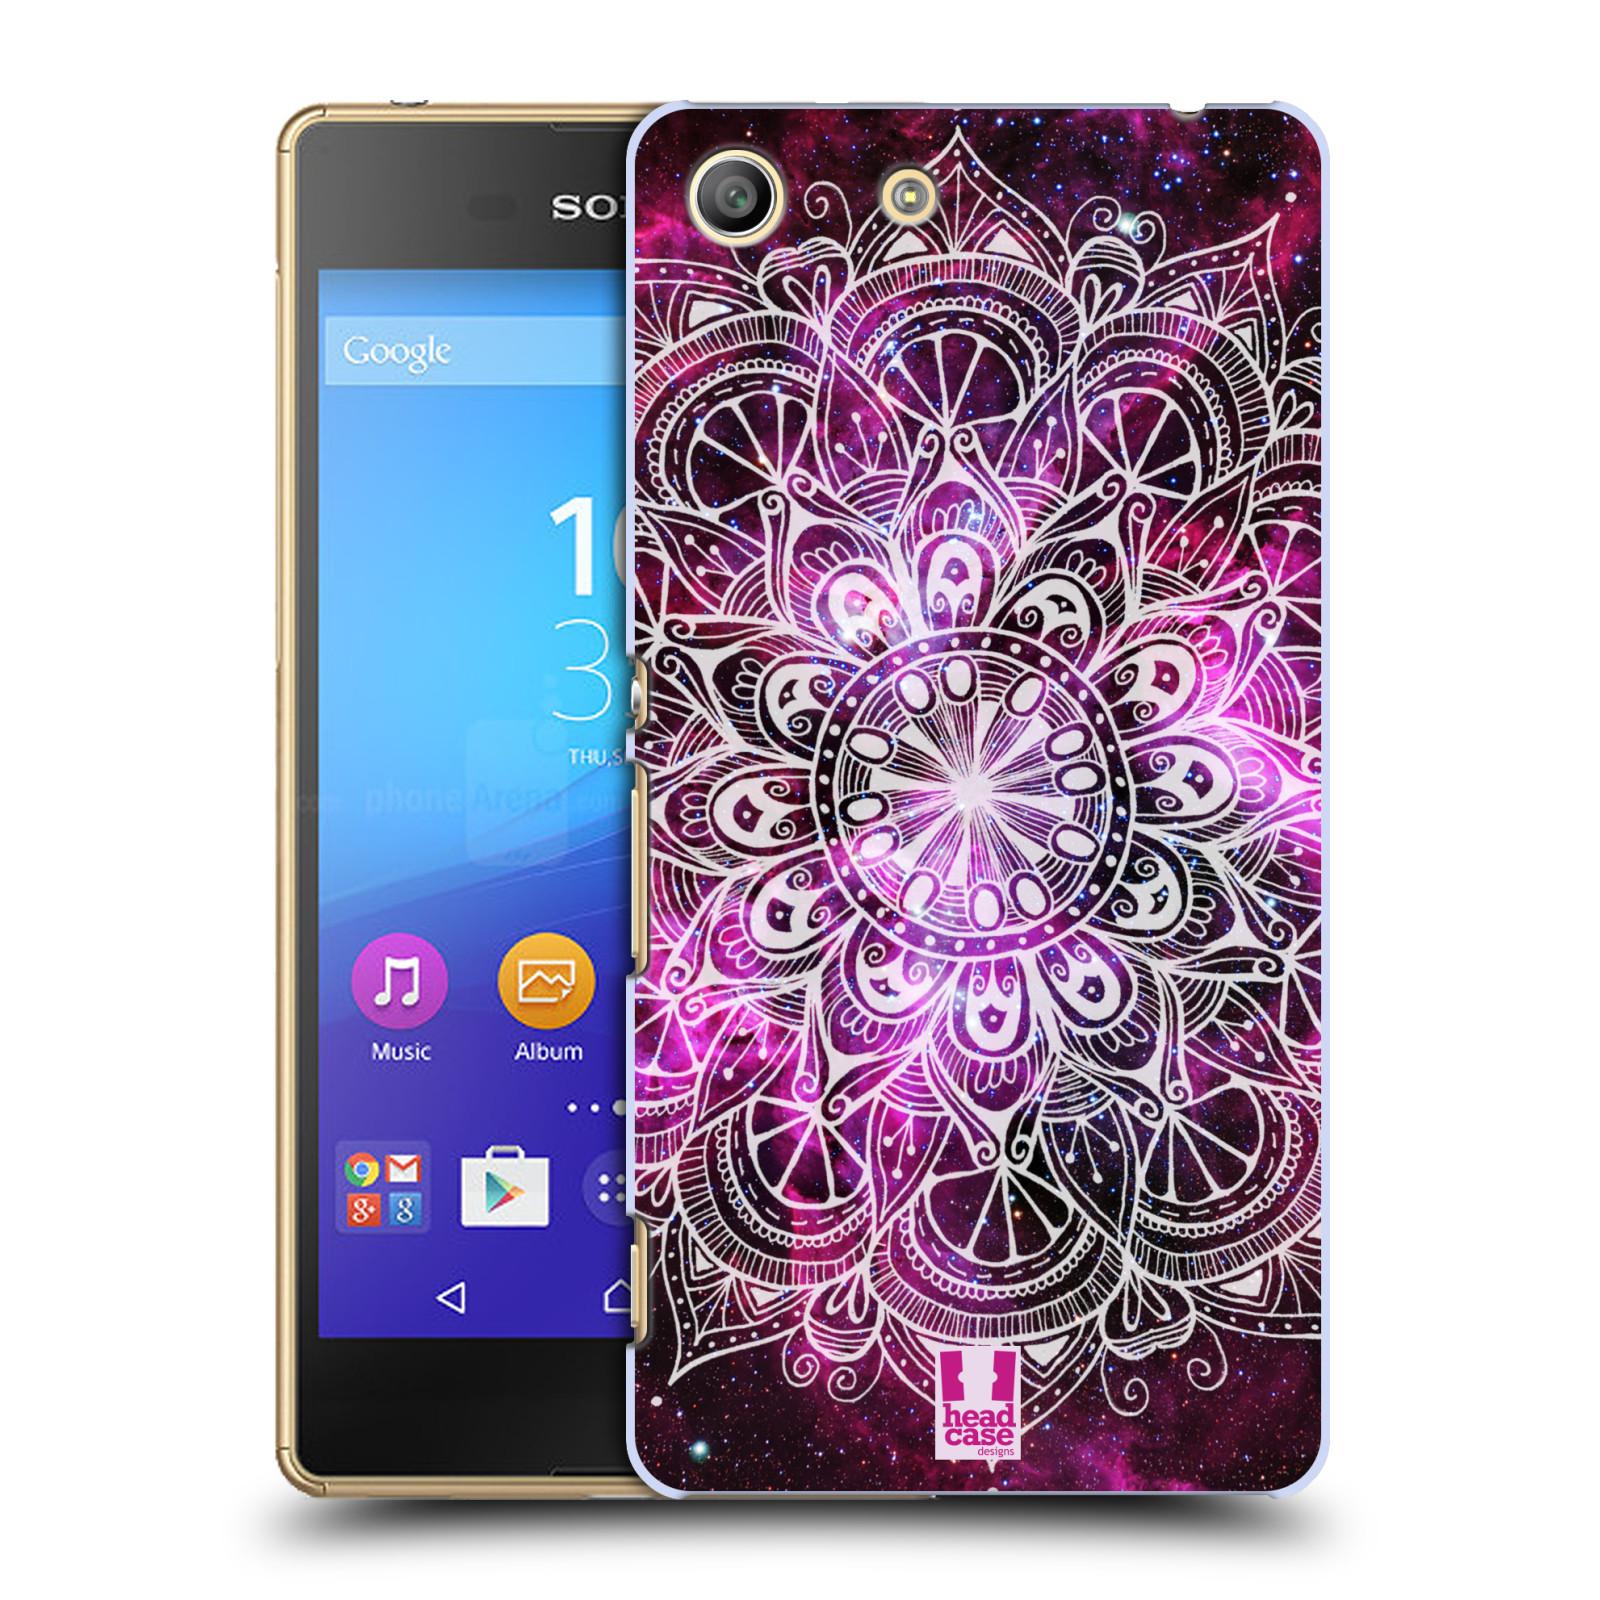 Plastové pouzdro na mobil Sony Xperia M5 HEAD CASE Mandala Doodle Nebula (Kryt či obal na mobilní telefon Sony Xperia M5 Aqua)